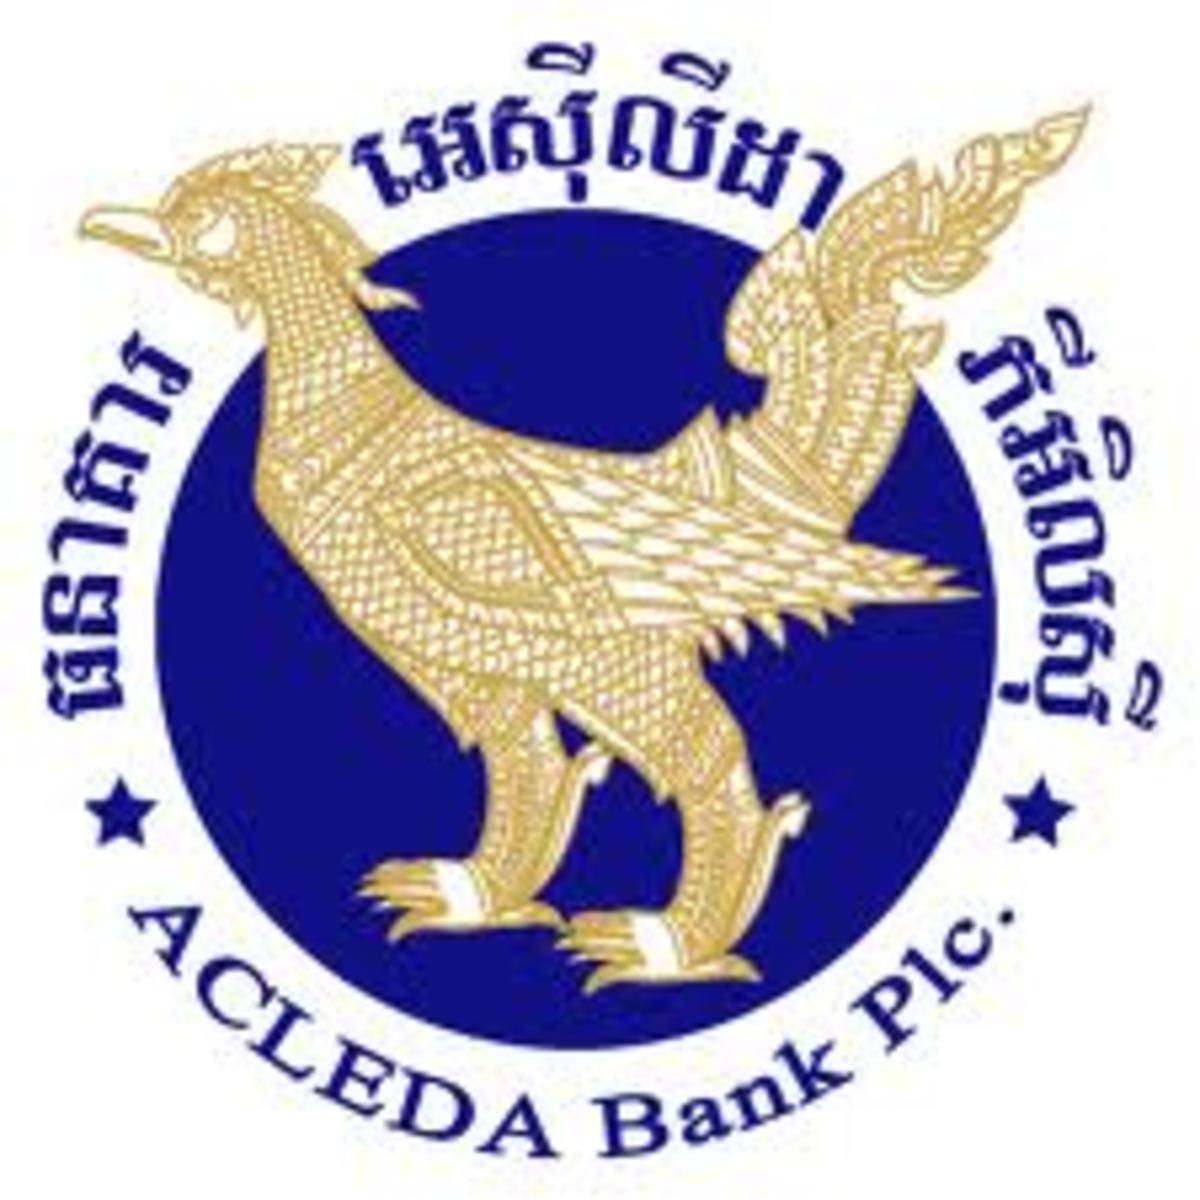 Acleda Bank Logo